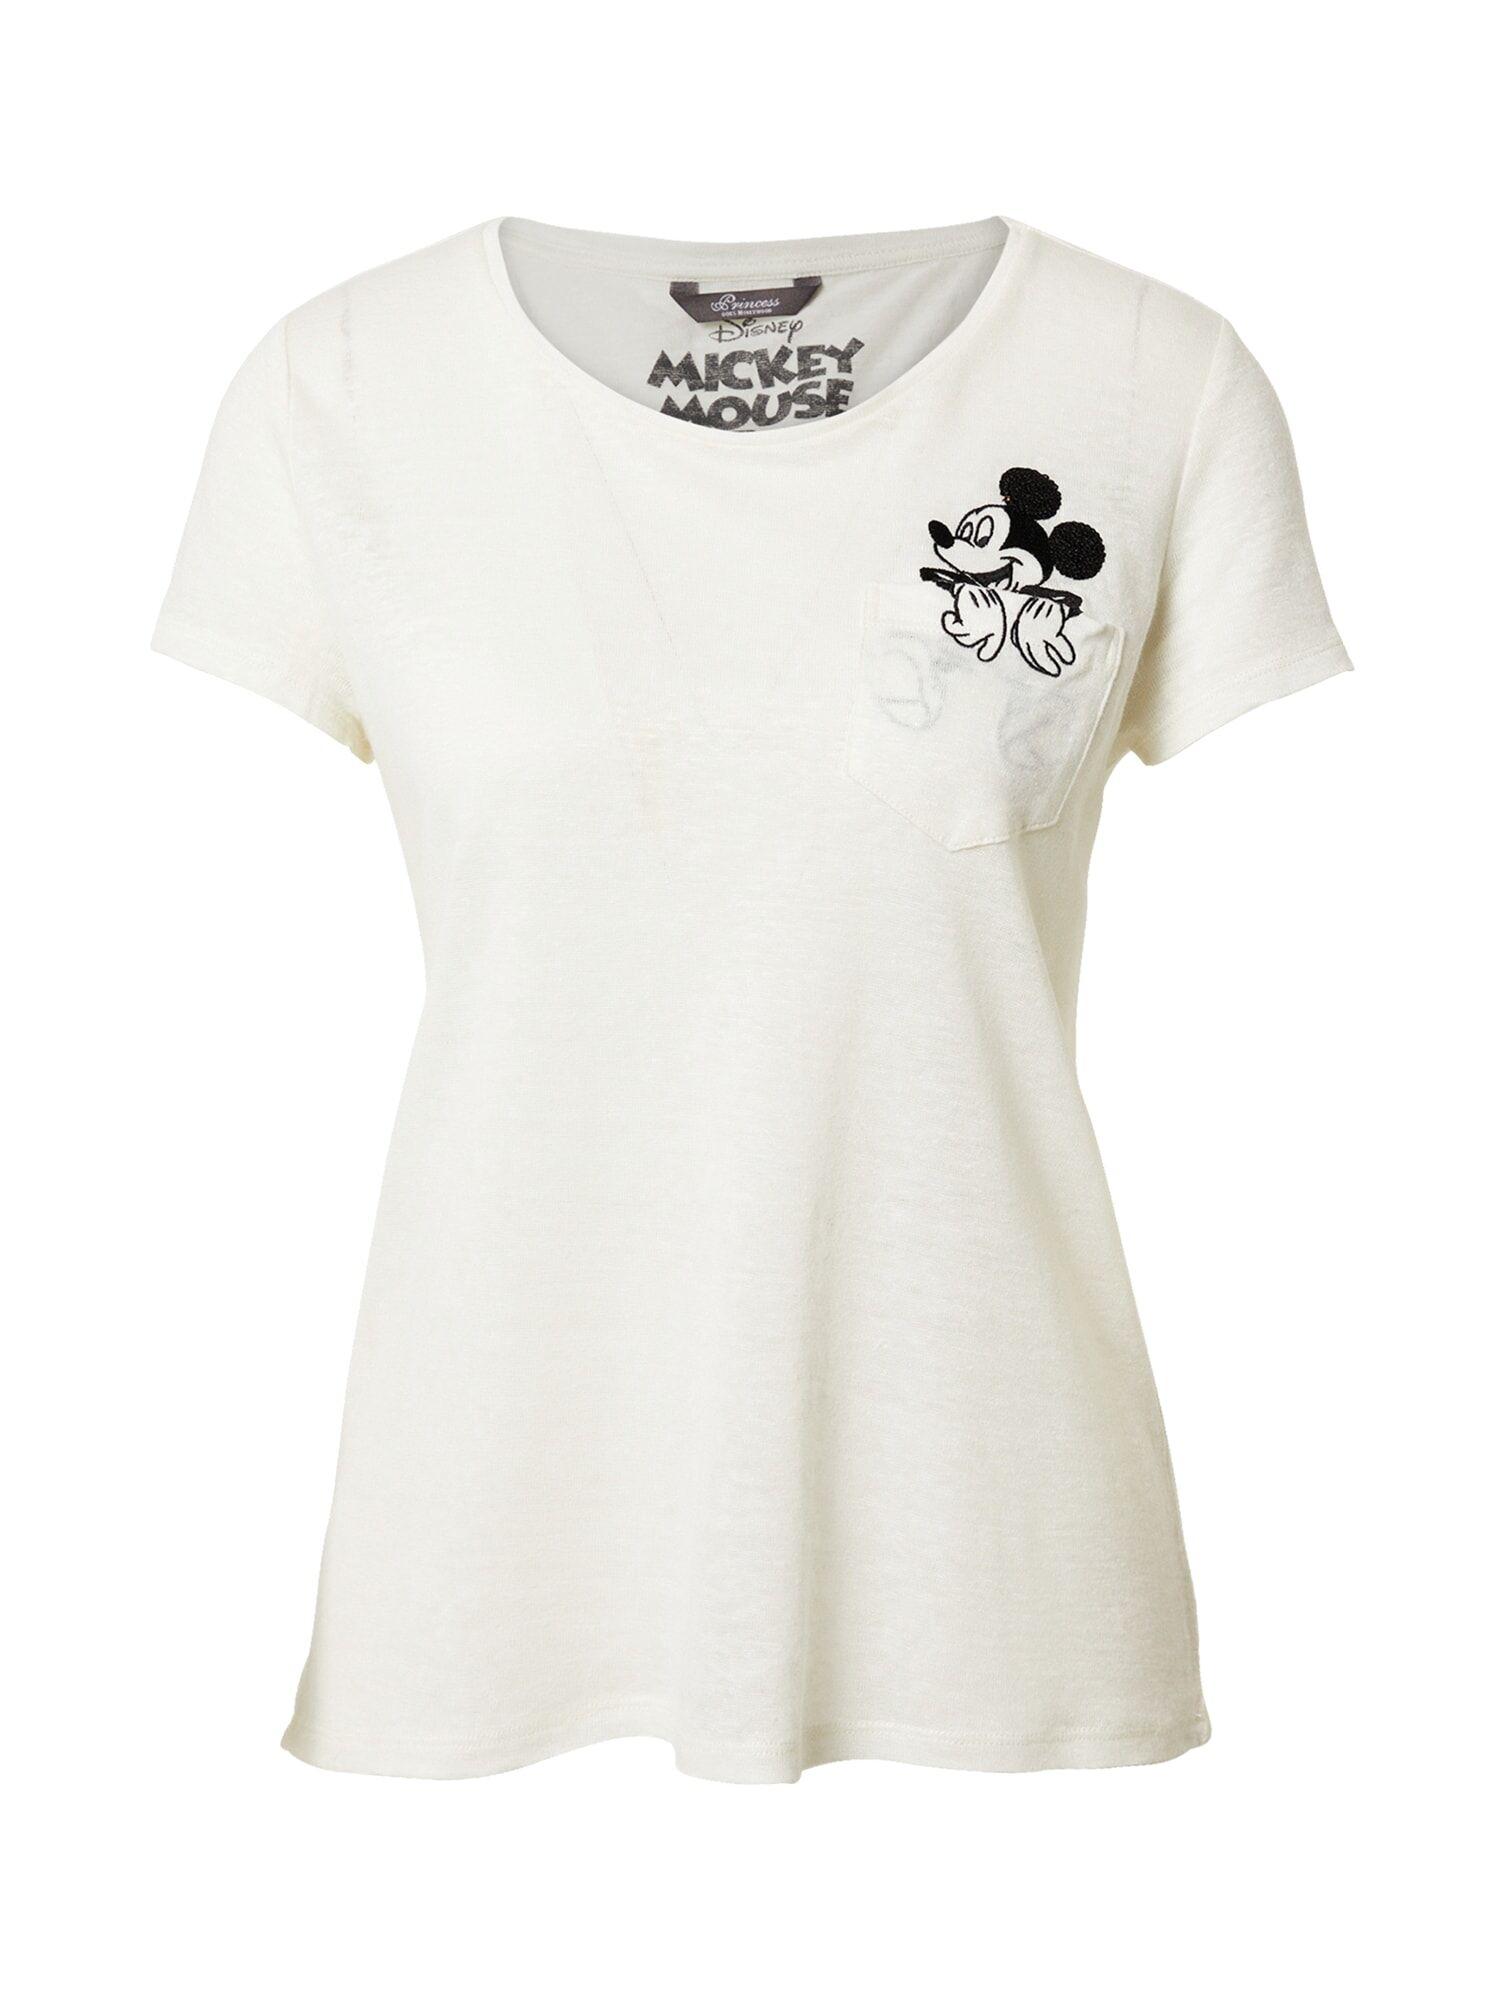 Princess T-shirt 'Mickey'  - Blanc - Taille: 36 - female